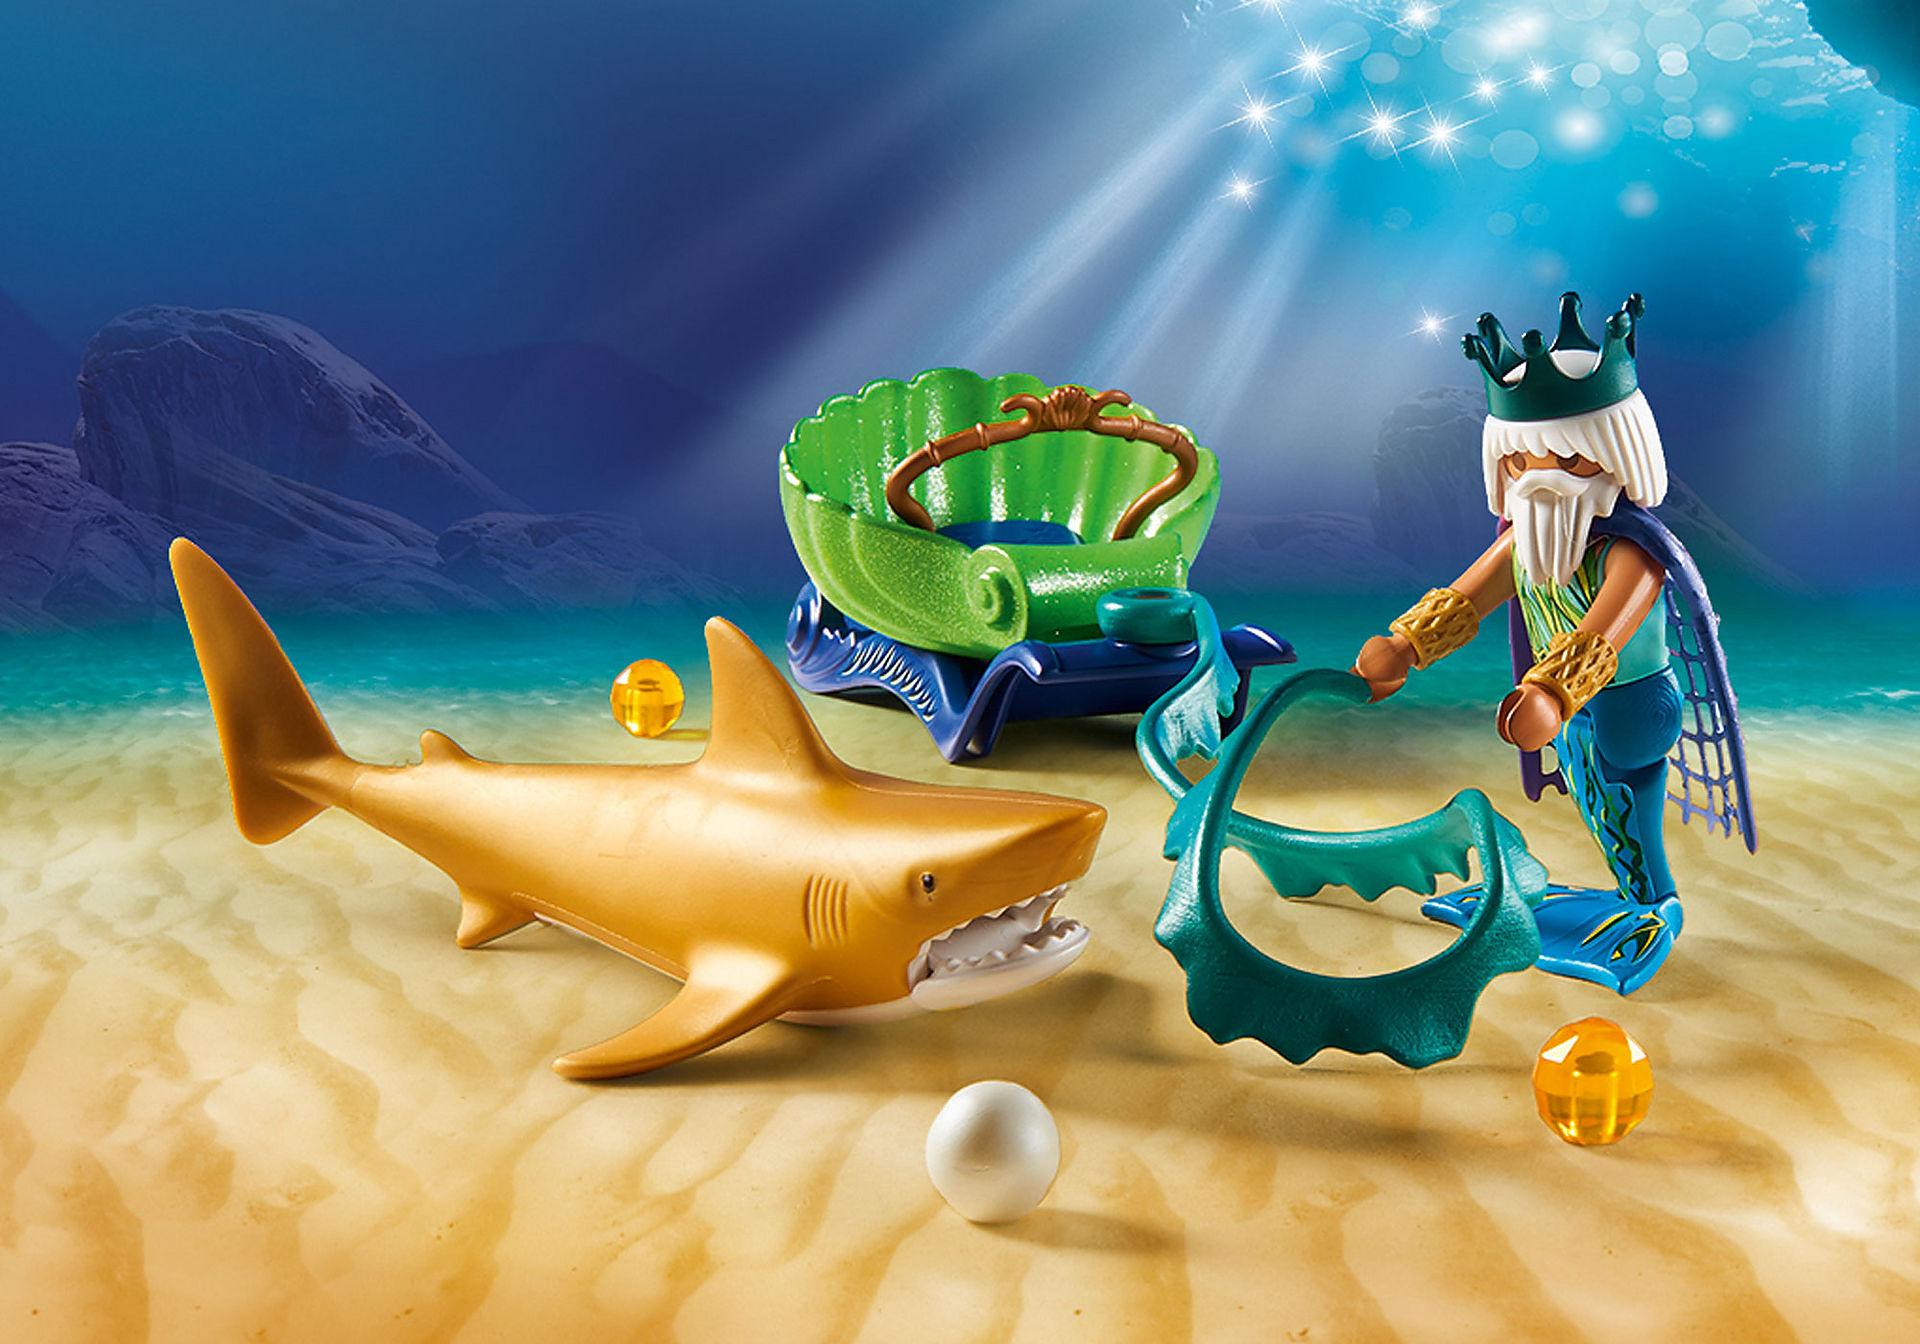 http://media.playmobil.com/i/playmobil/70097_product_extra1/Roi des mers avec calèche royale